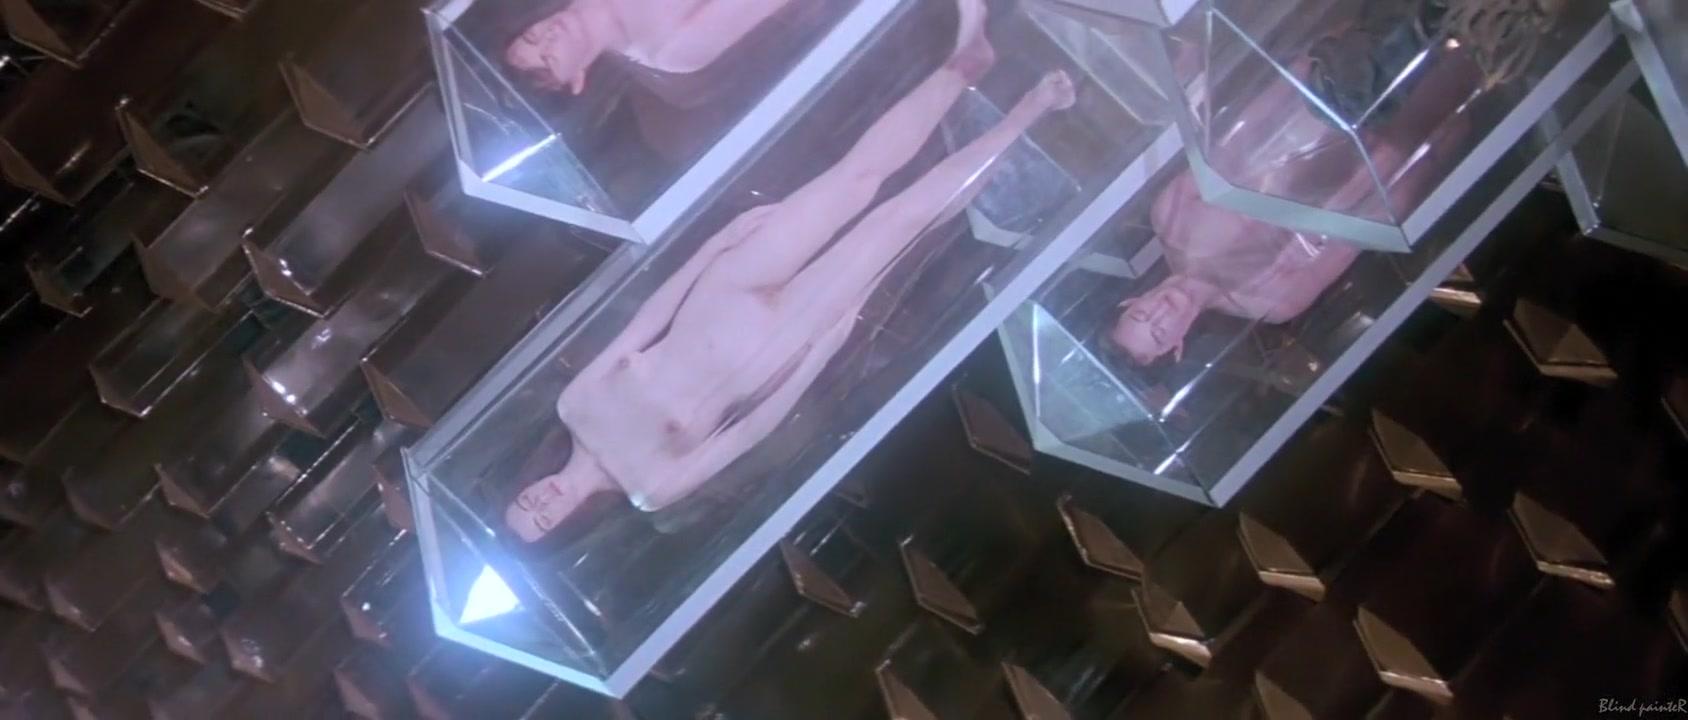 xXx Videos Wwe diva ashely nude